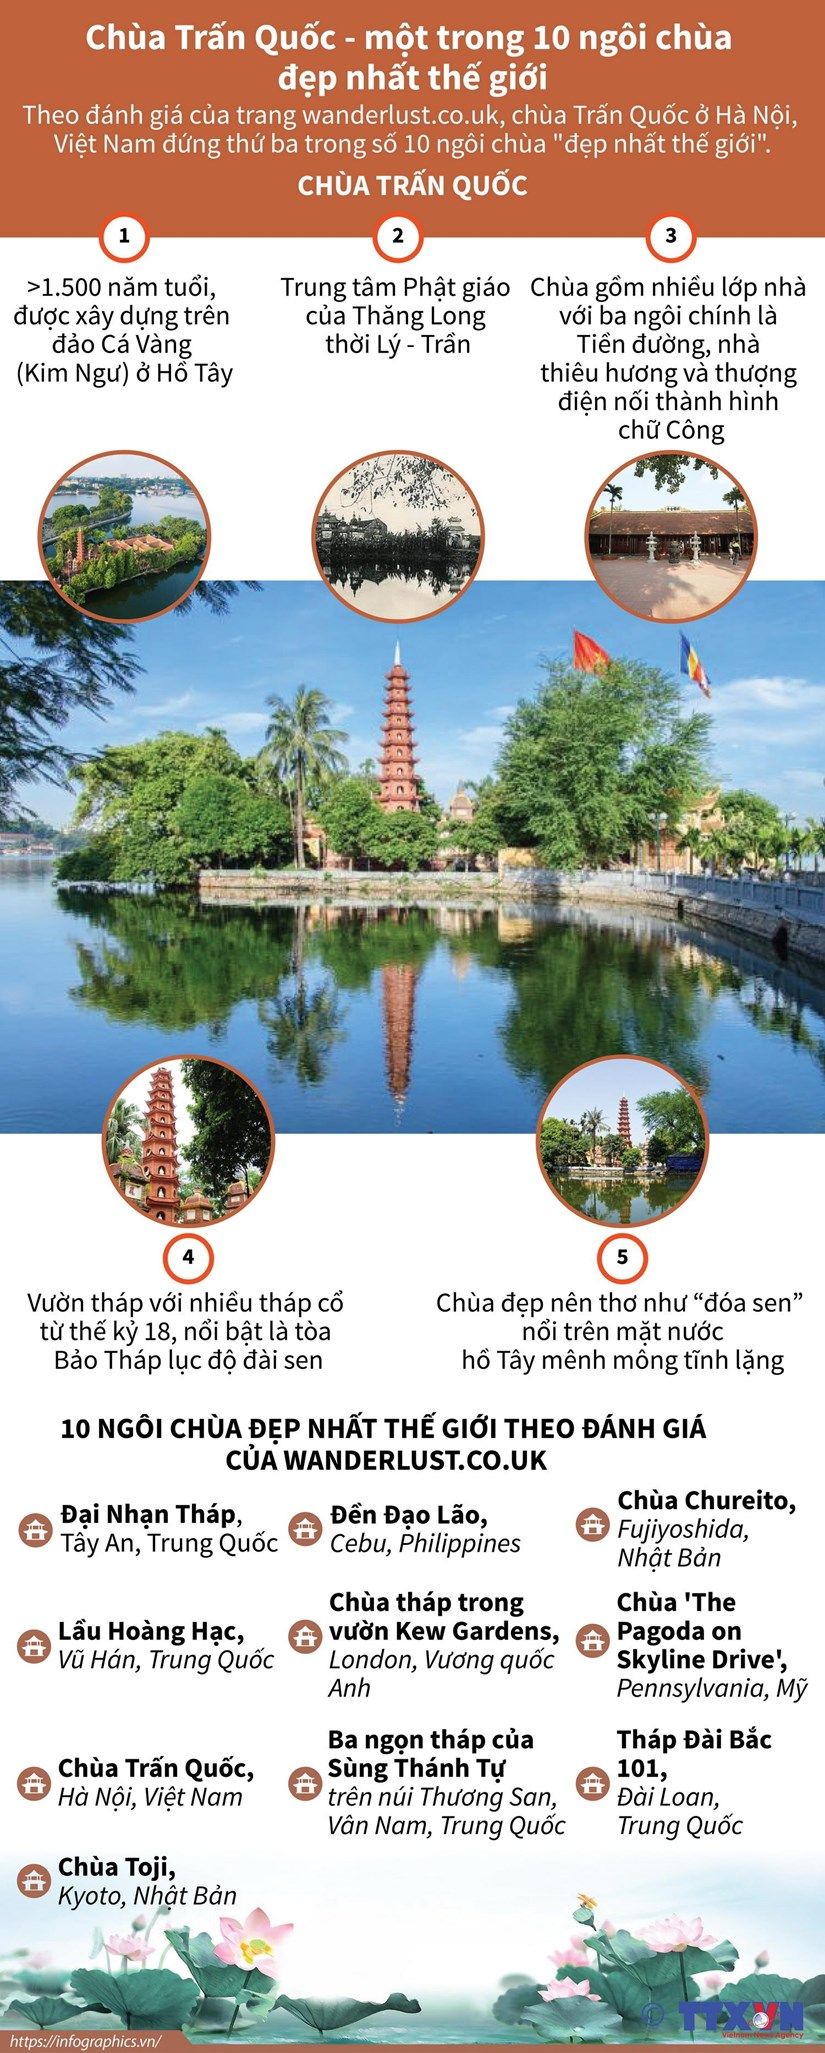 Chua Tran Quoc - Mot trong 10 ngoi chua dep nhat the gioi hinh anh 1